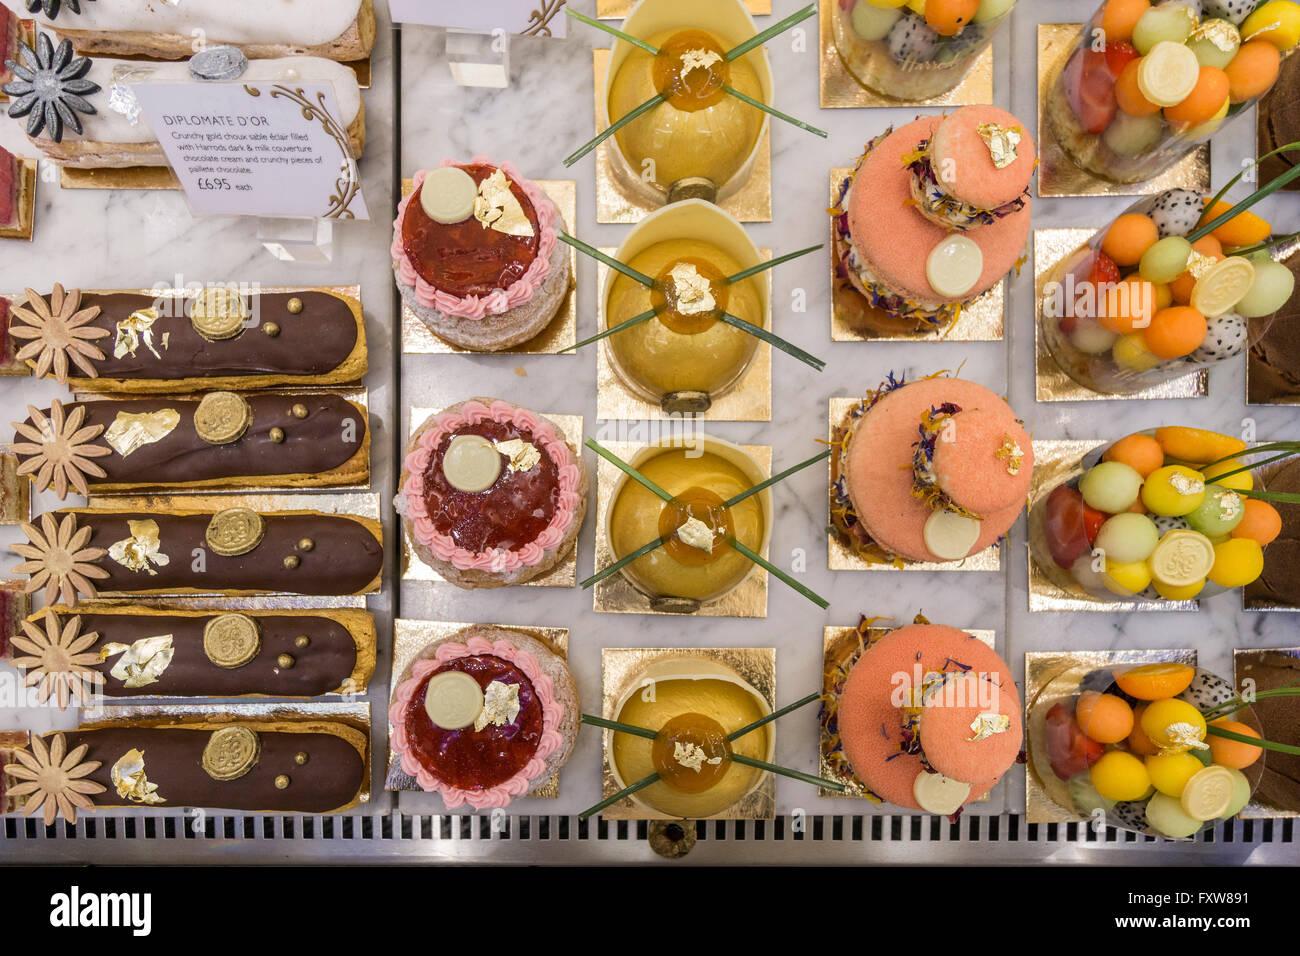 UK, England, London, Knightsbridge, Harrods, Display of Cakes - Stock Image